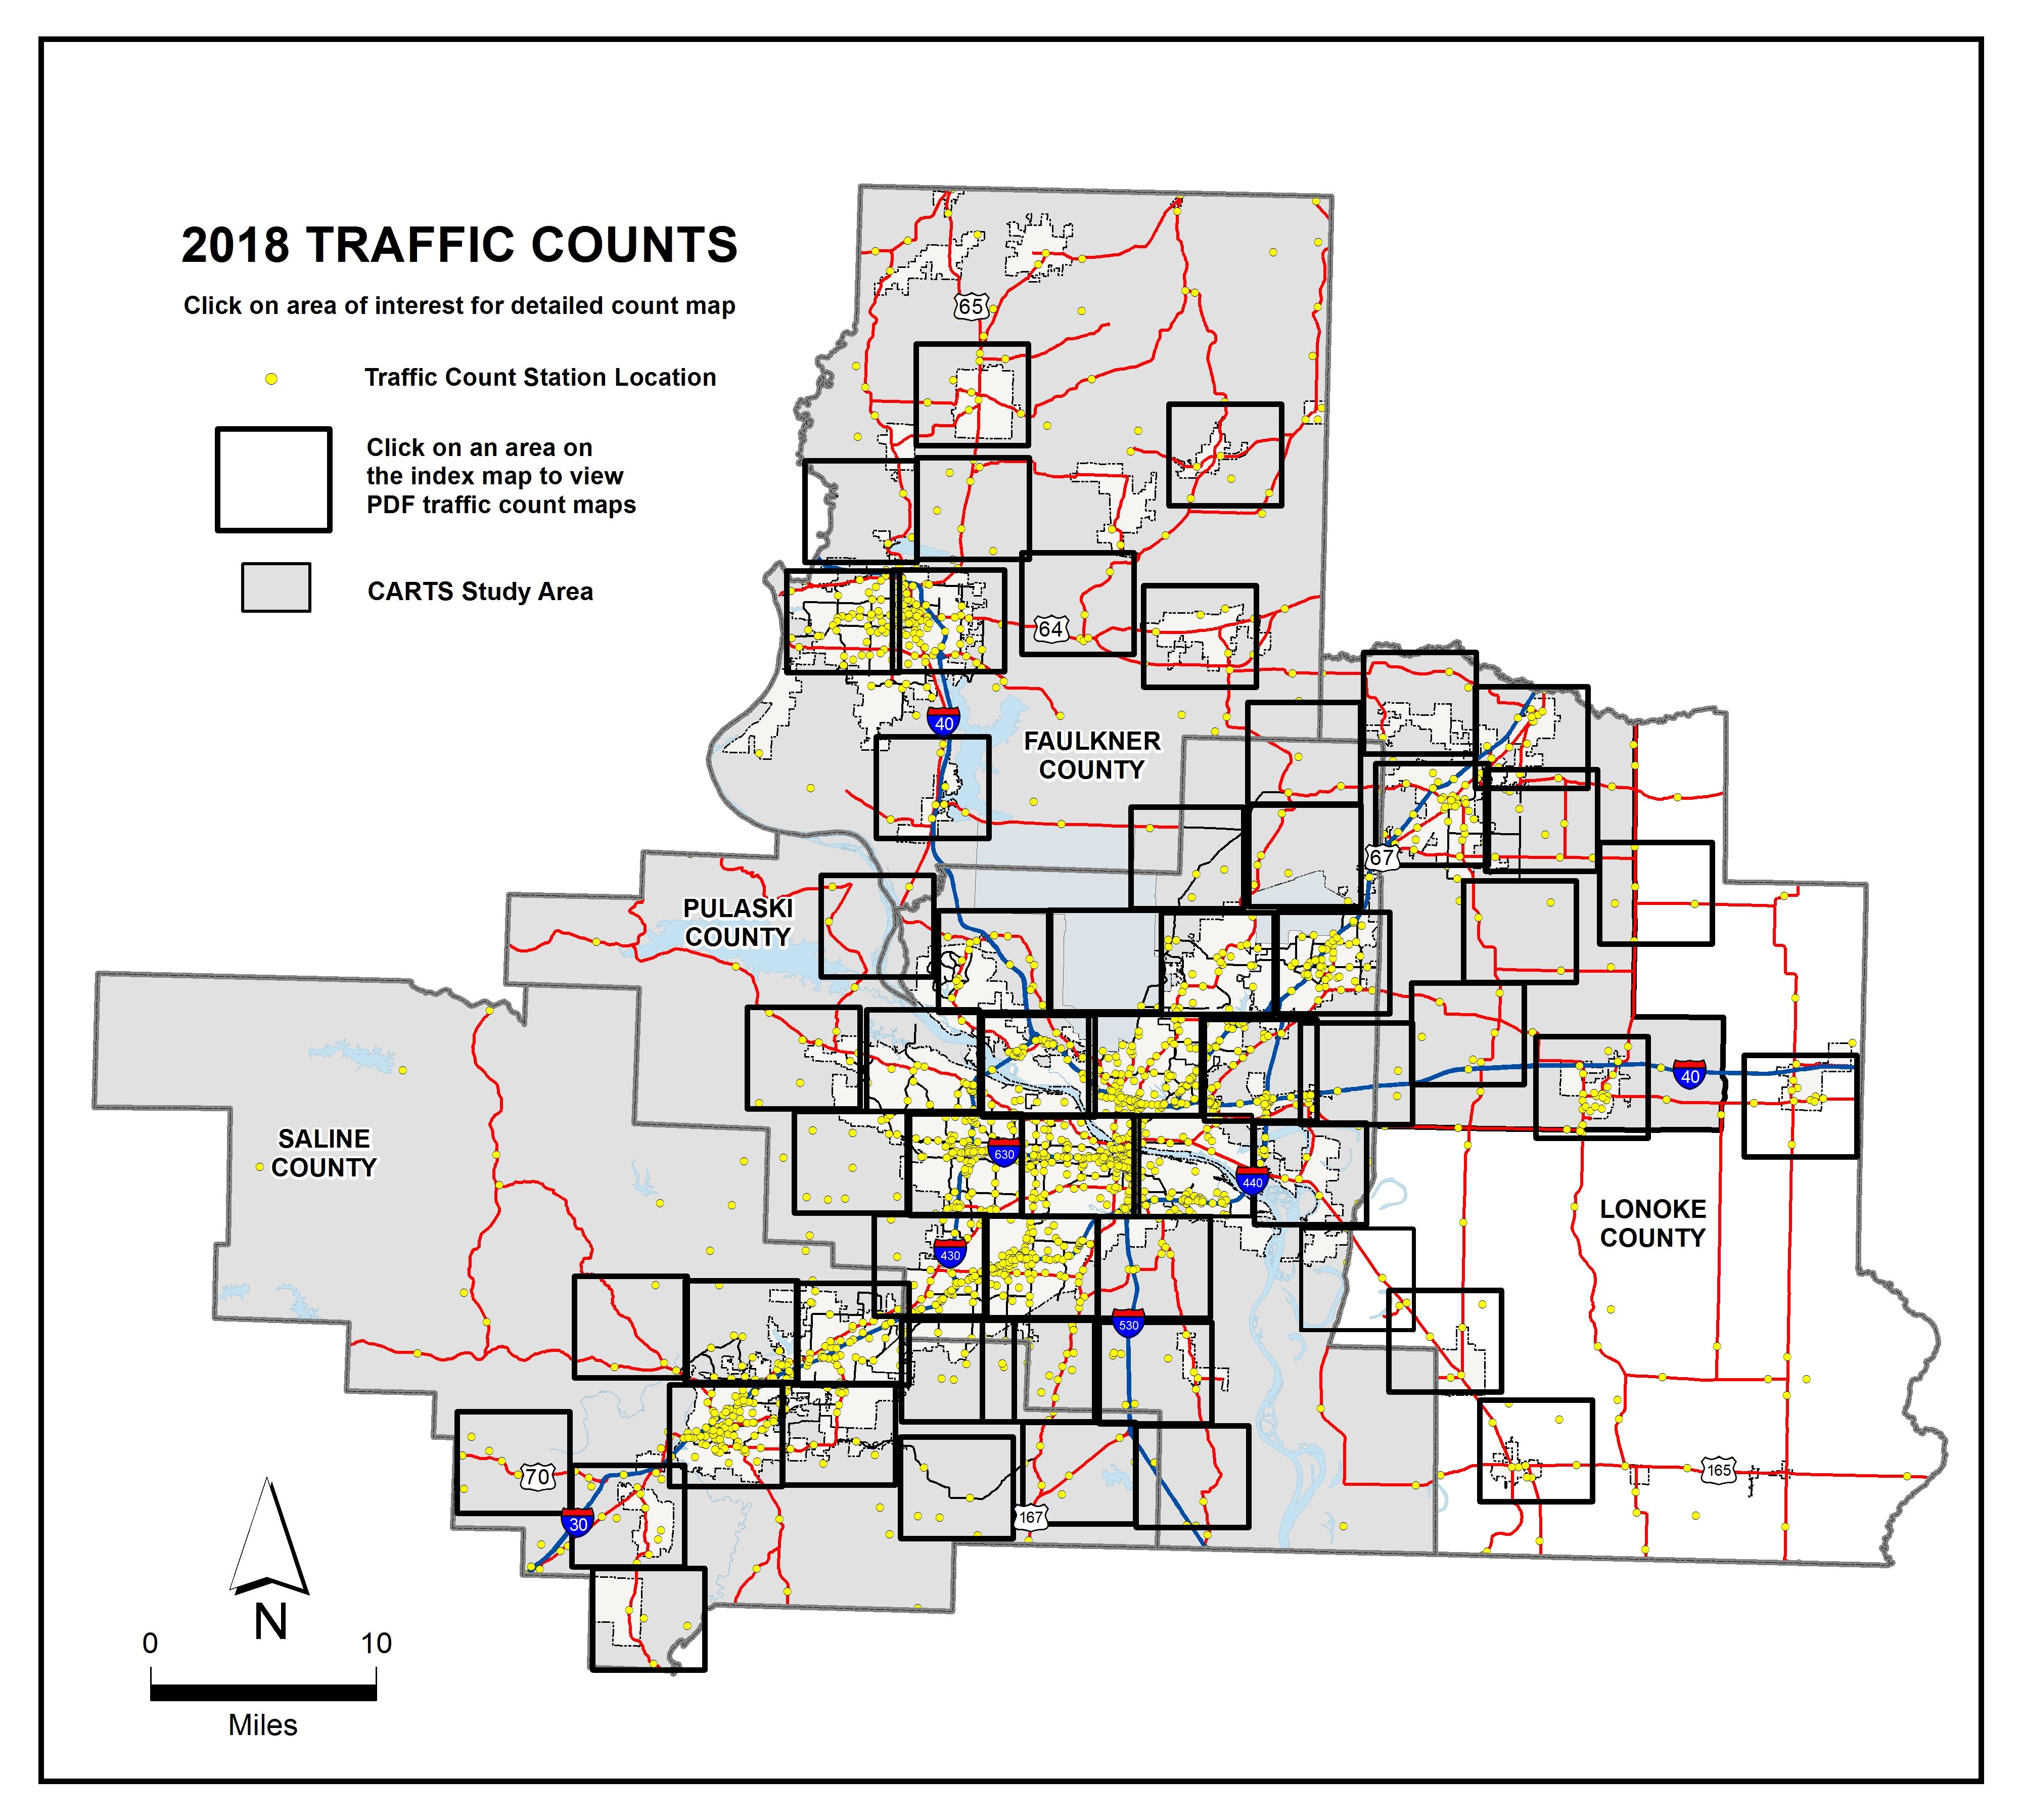 2018 Traffic Counts